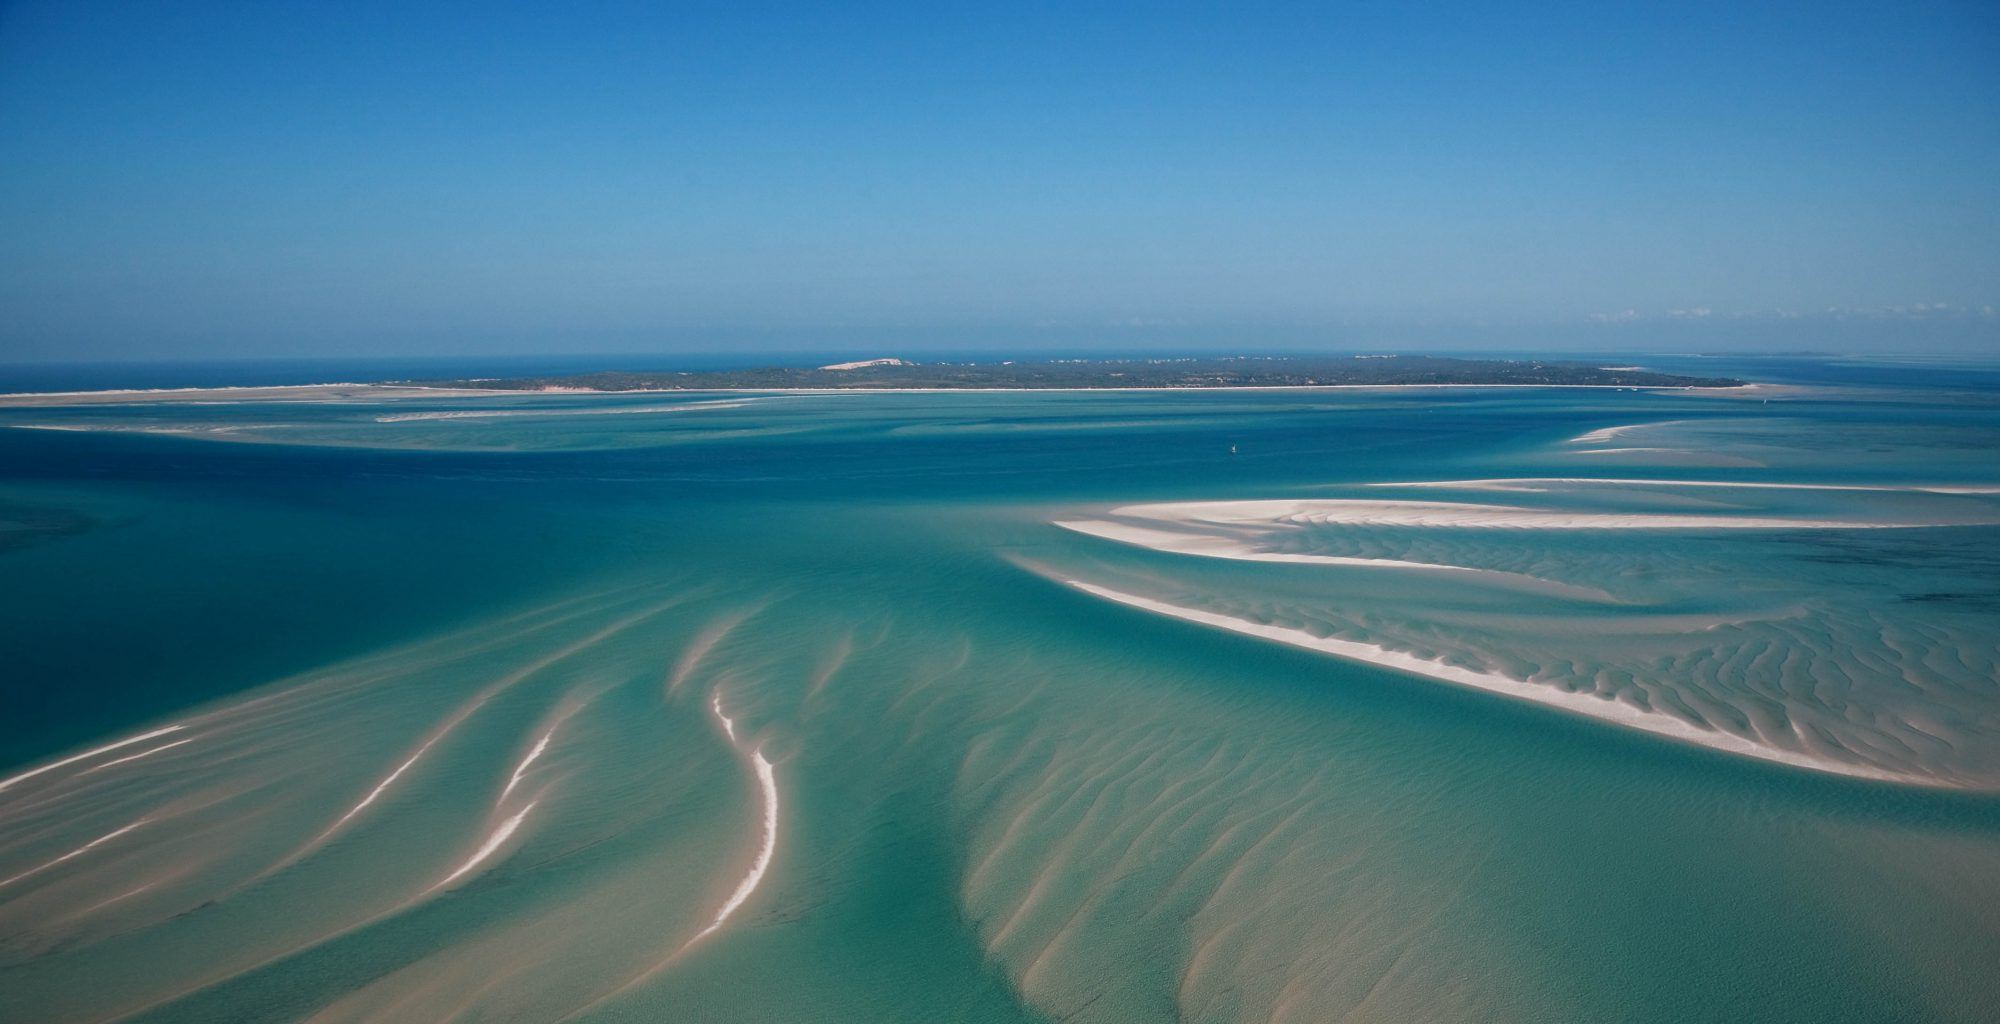 Mozambique-Bazaruto-Archipelago-Benguerra-Aerial